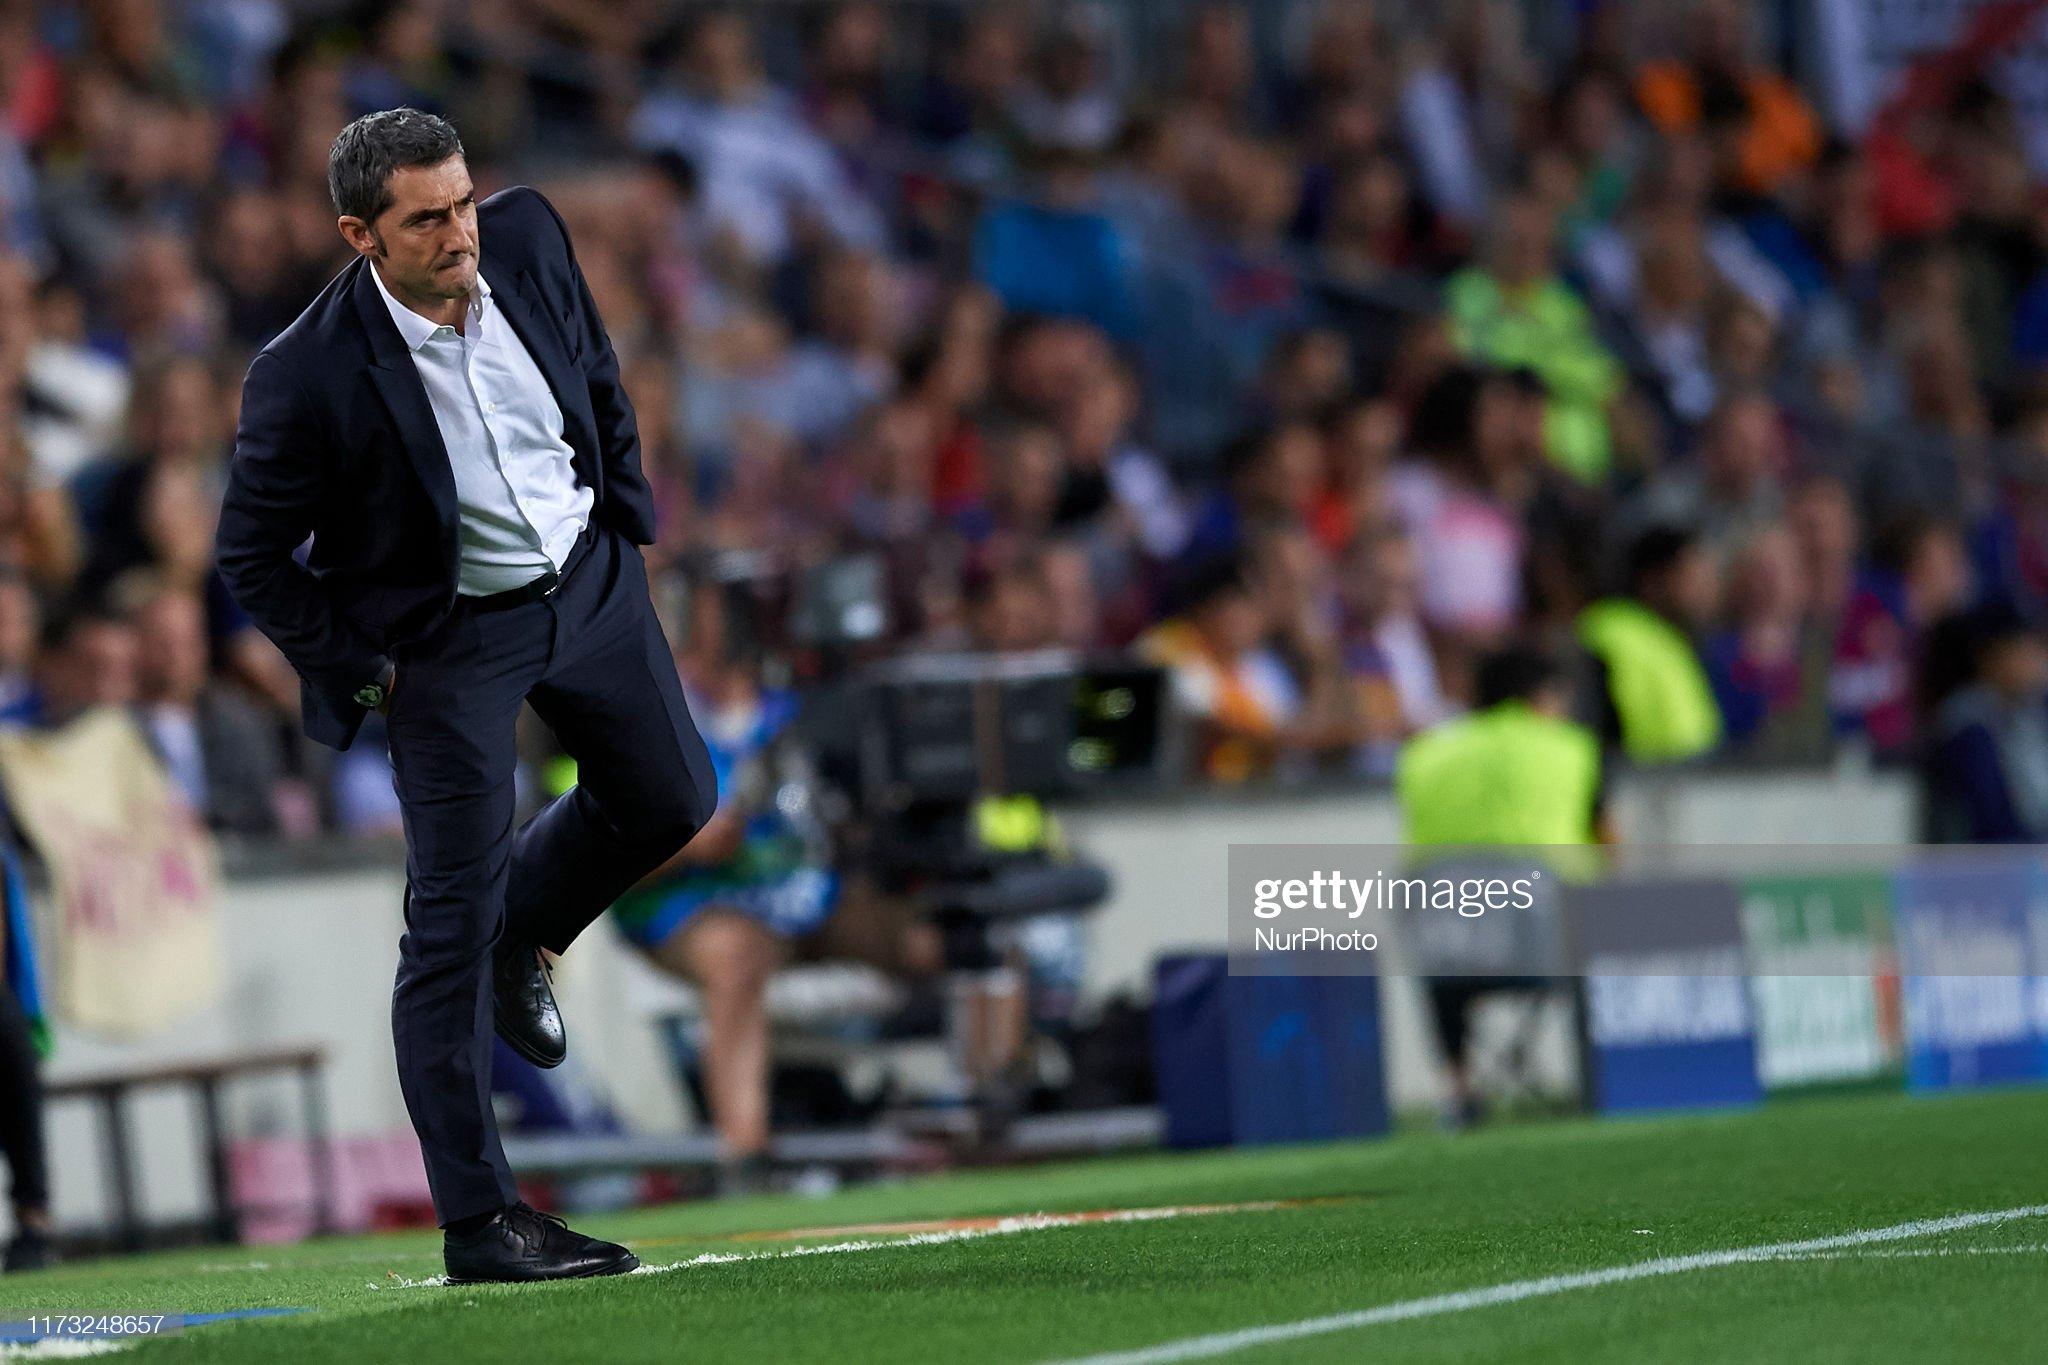 صور مباراة : برشلونة - إنتر 2-1 ( 02-10-2019 )  Ernestro-valverde-head-coach-of-barcelona-looks-on-during-the-uefa-picture-id1173248657?s=2048x2048